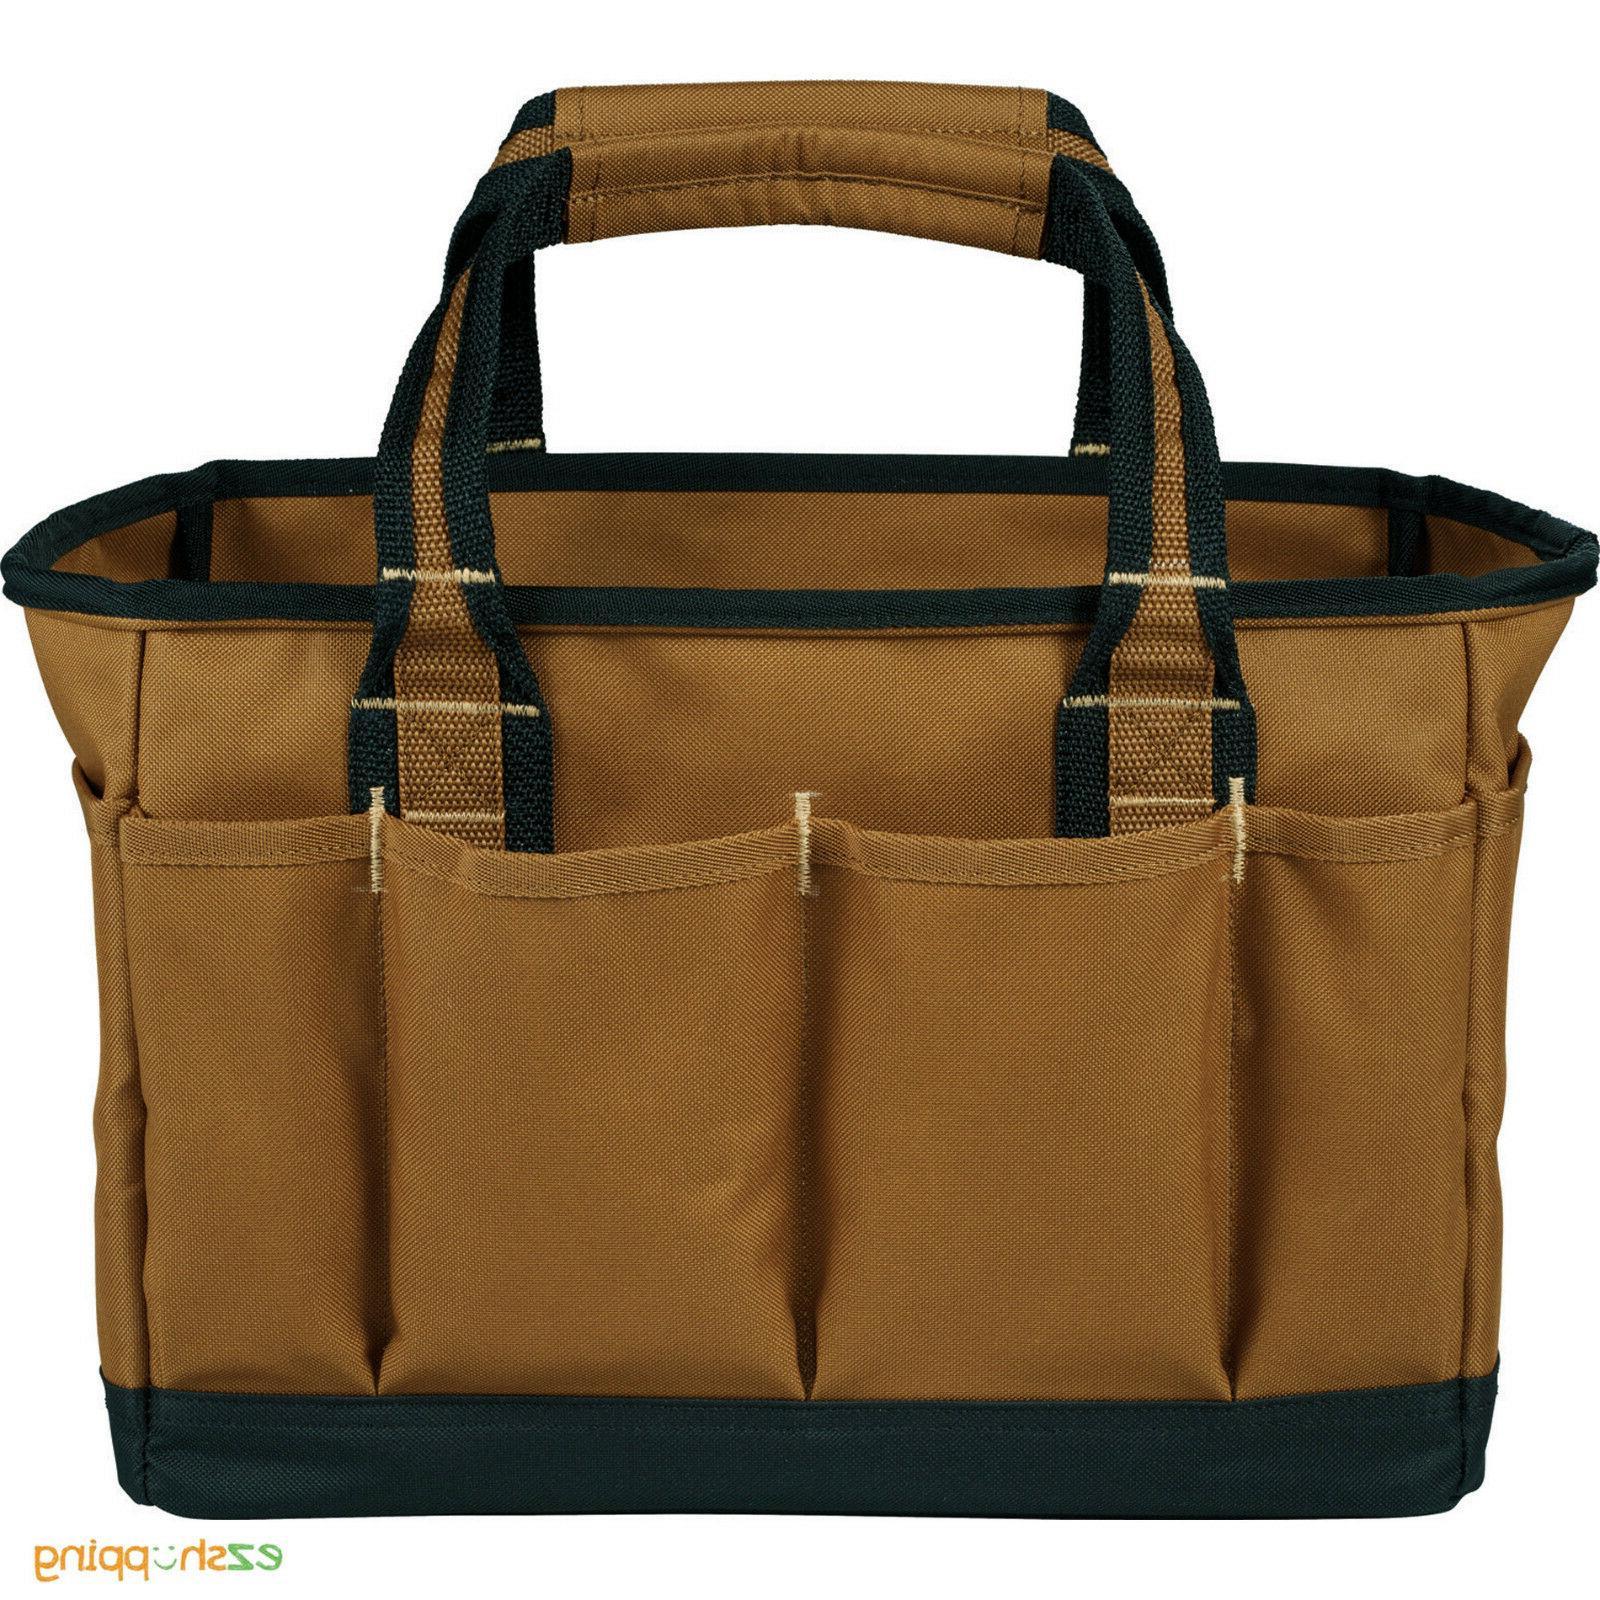 New Signature Tool Bag Free Shipping